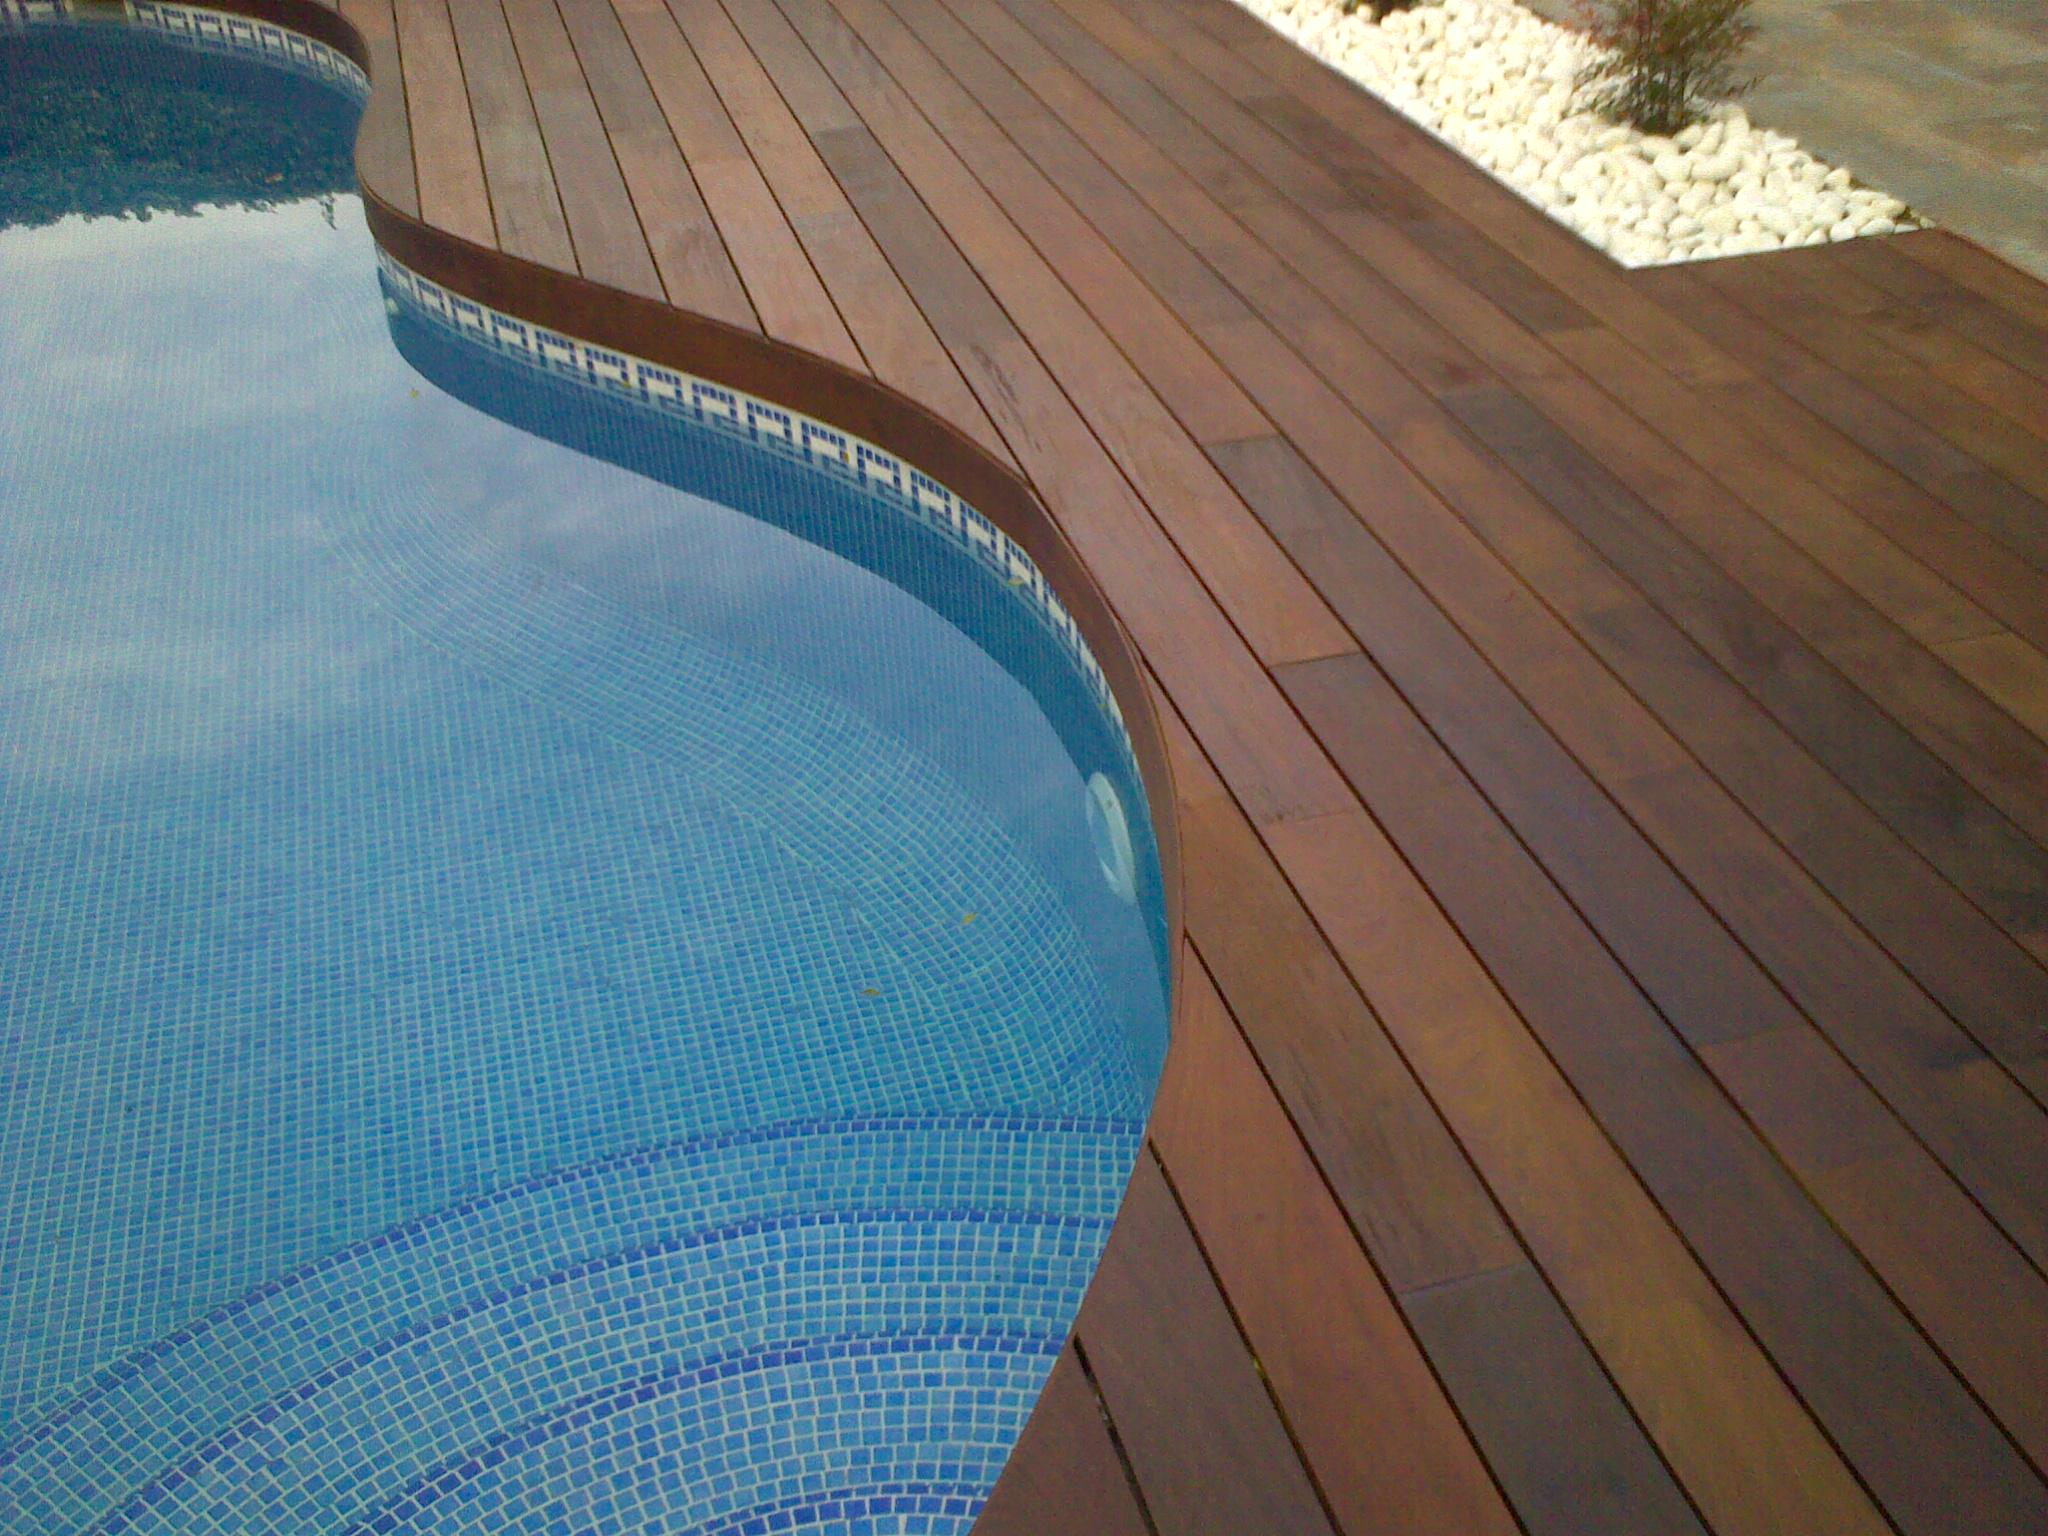 https://topmadera.com/wp-content/uploads/Mamperlan-curvo-en-piscina-de-madera-de-ipe-en-Valdemorillo.jpg